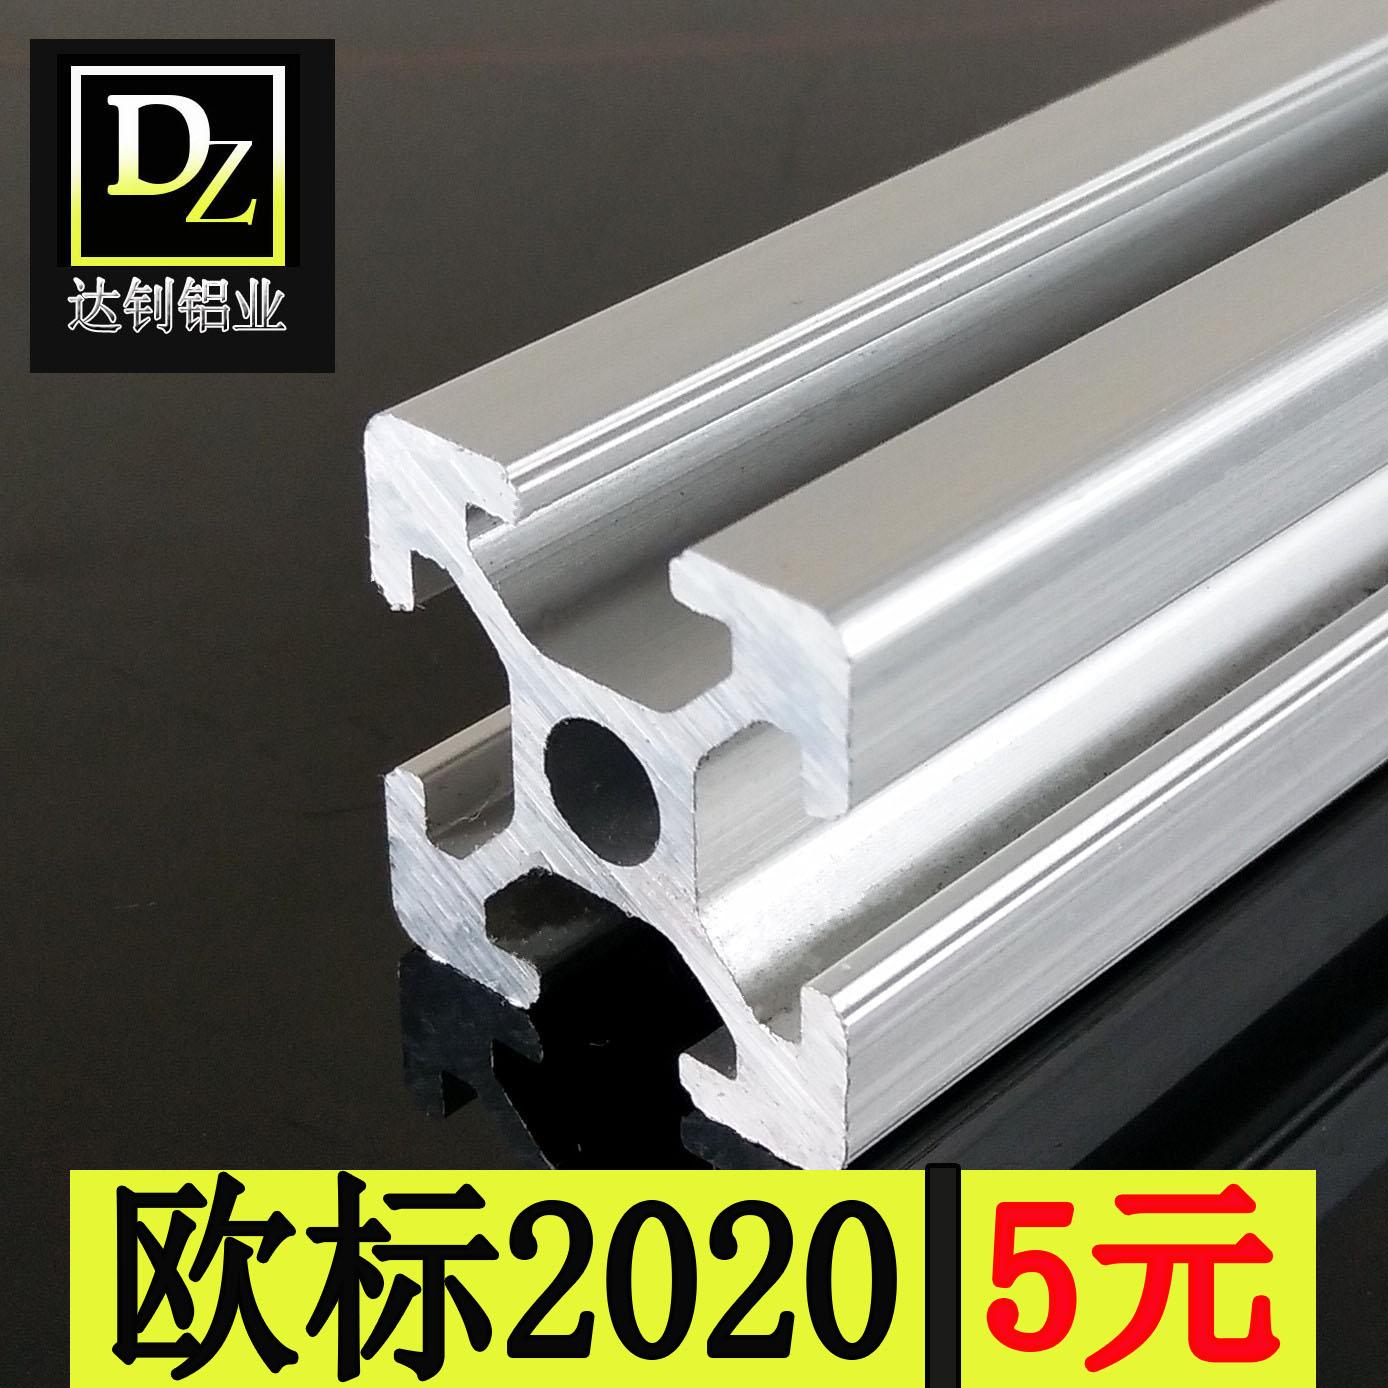 �W�斯�I�X合金型材2020�X型材光伏支架�X合金方管�C架型材�~缸架